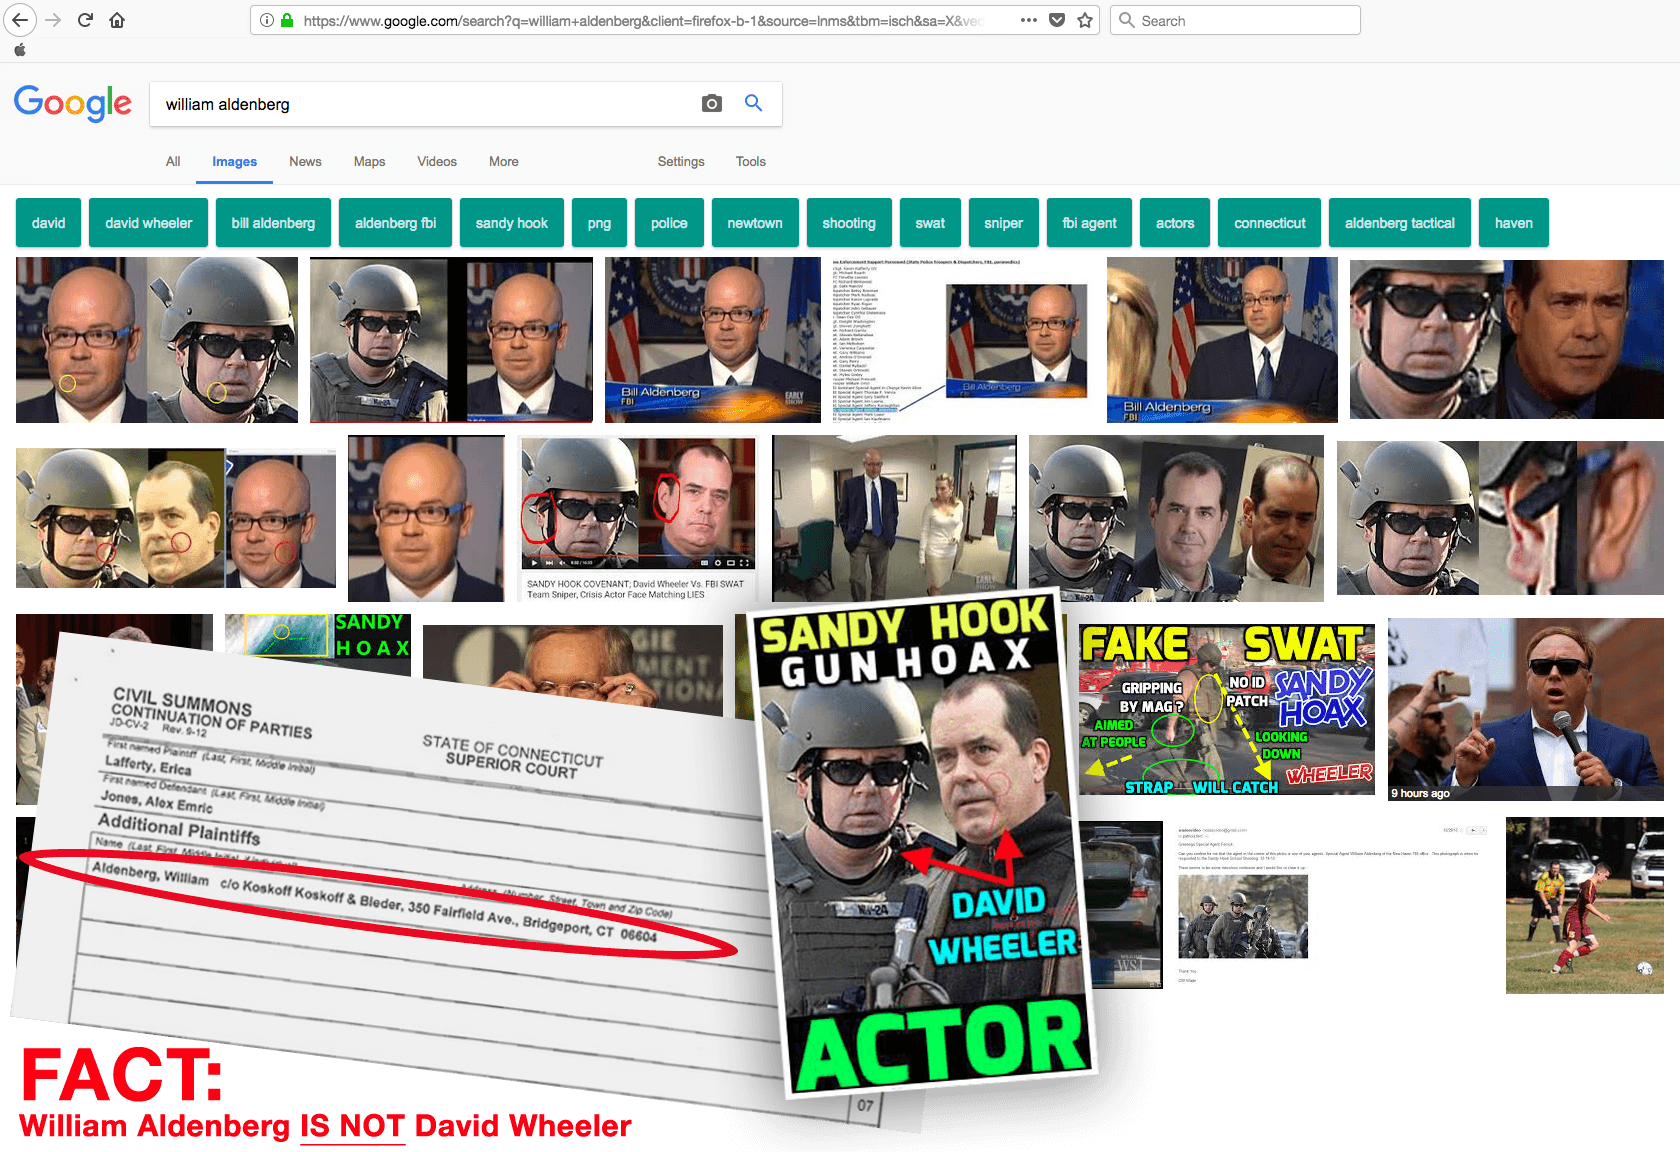 William Aldenberg - Google images search.